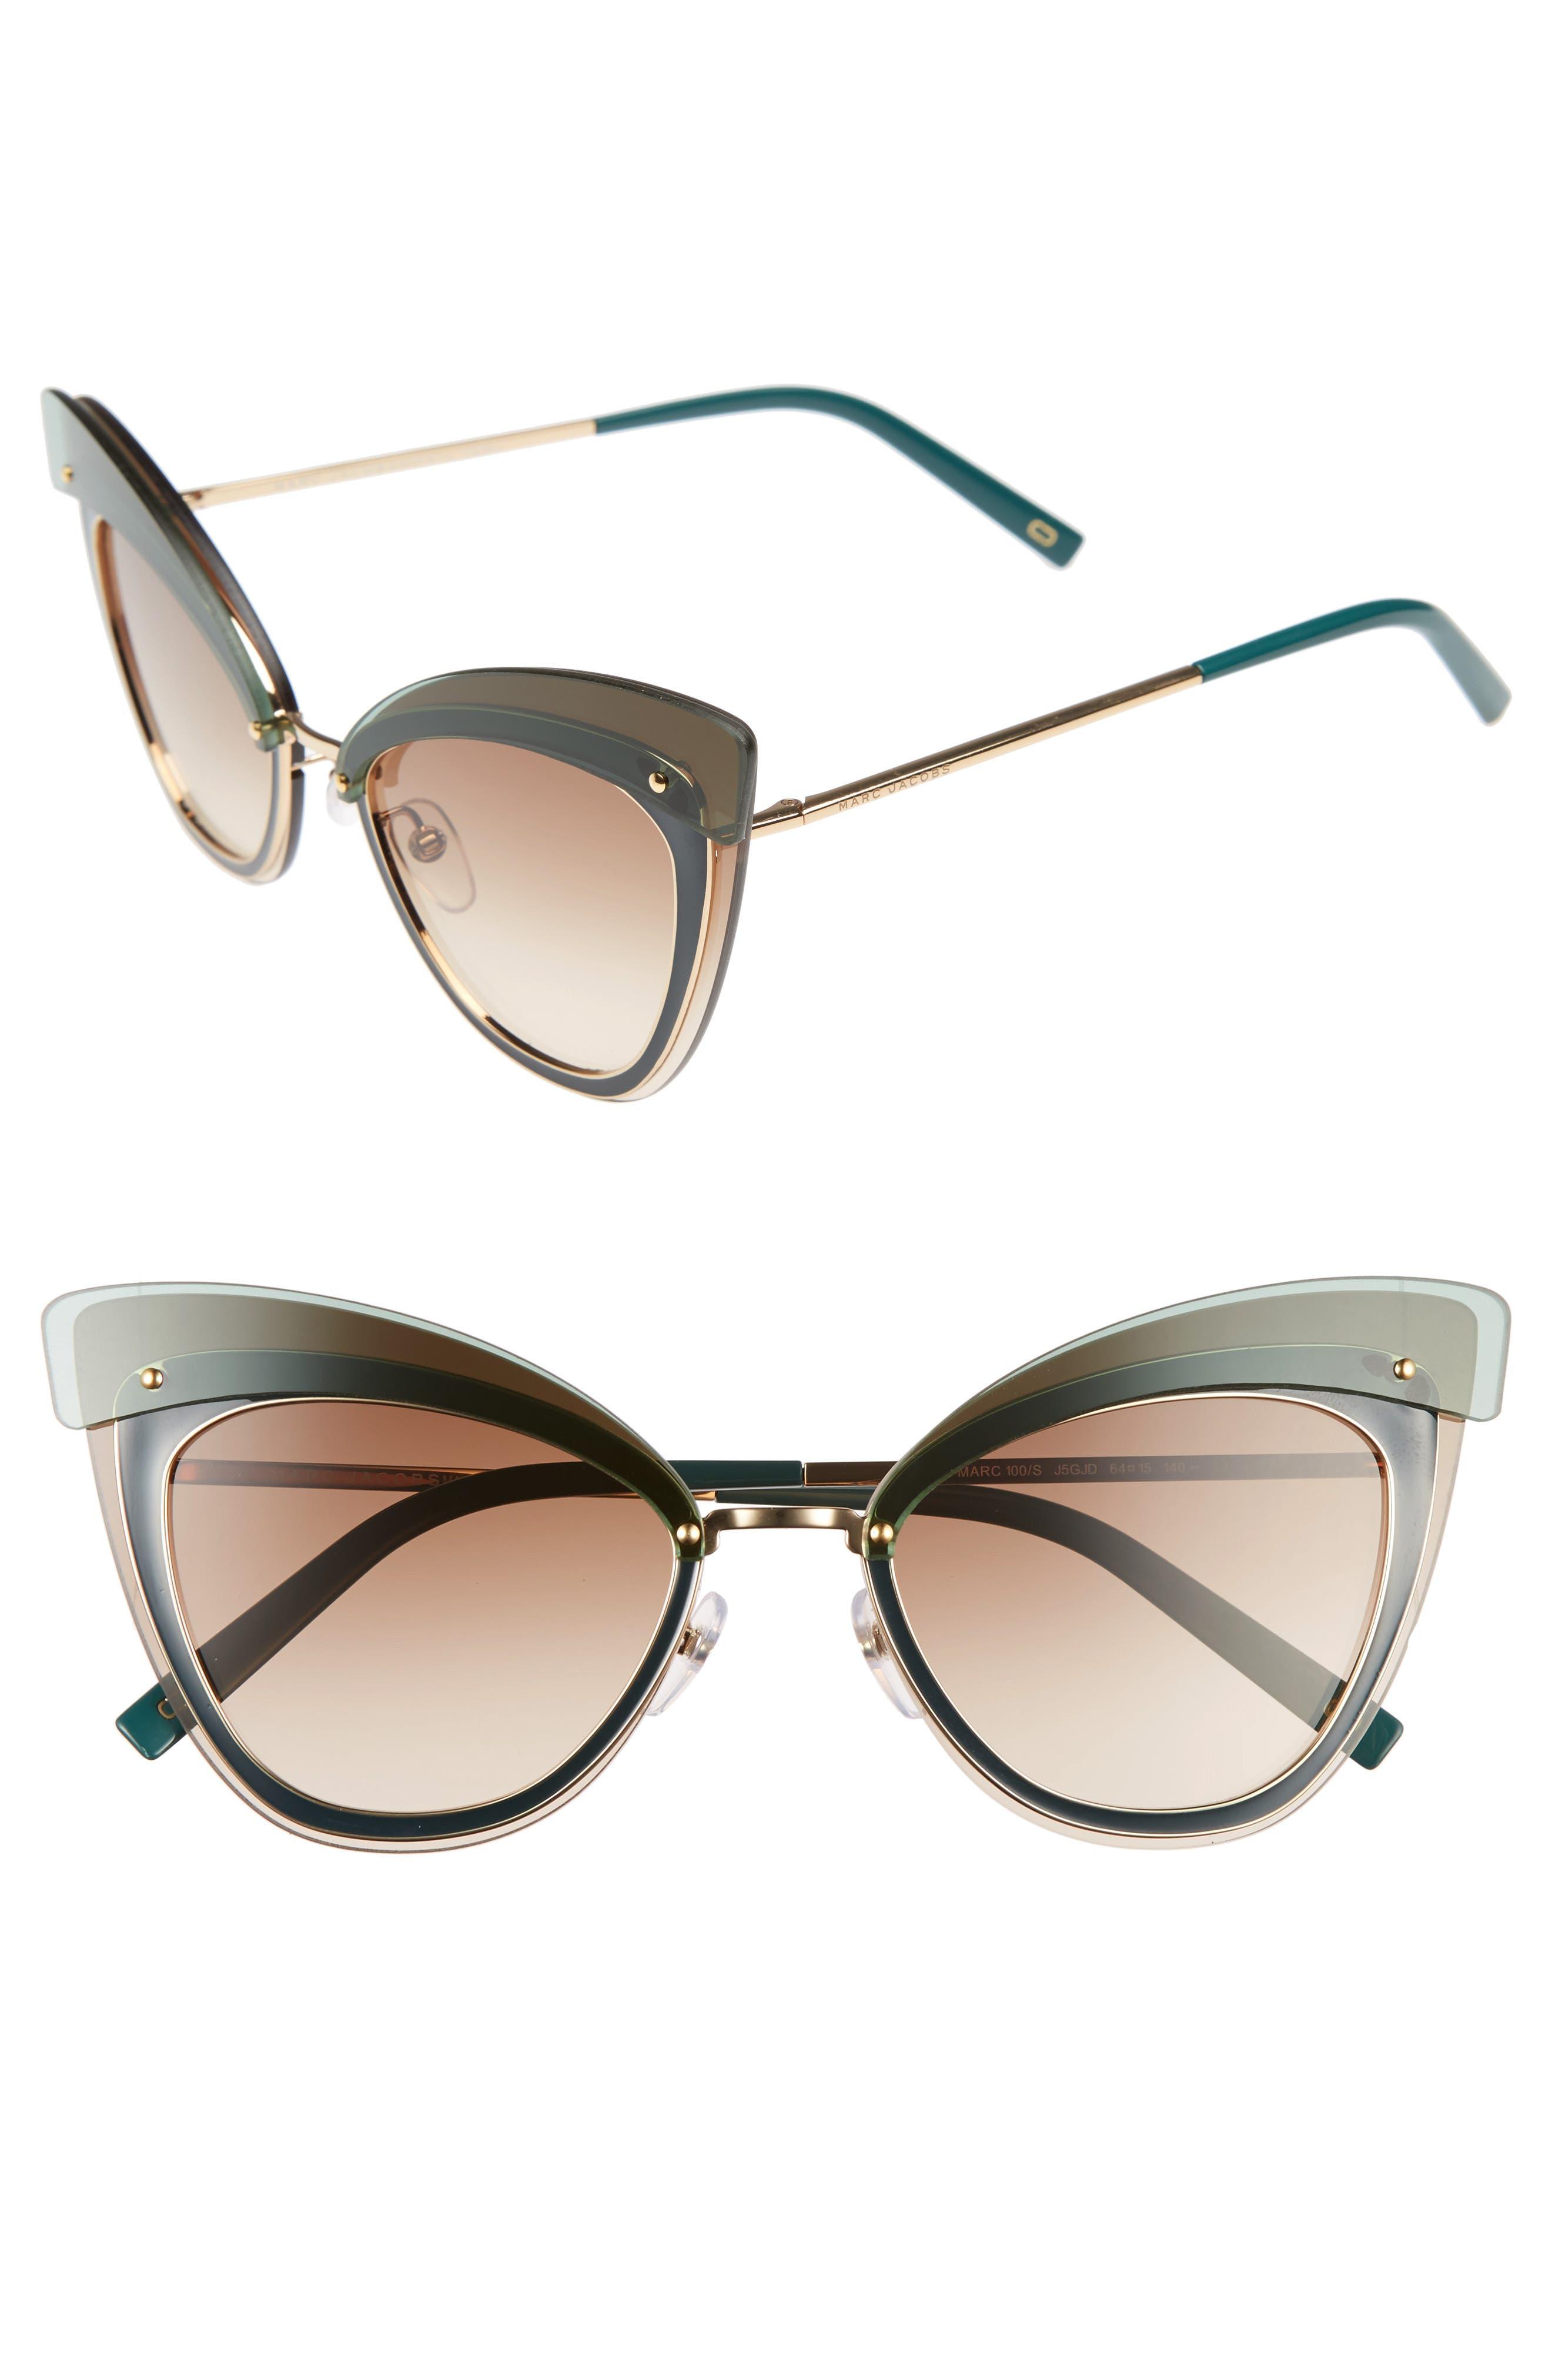 64mm Sunglasses,                             Main thumbnail 3, color,